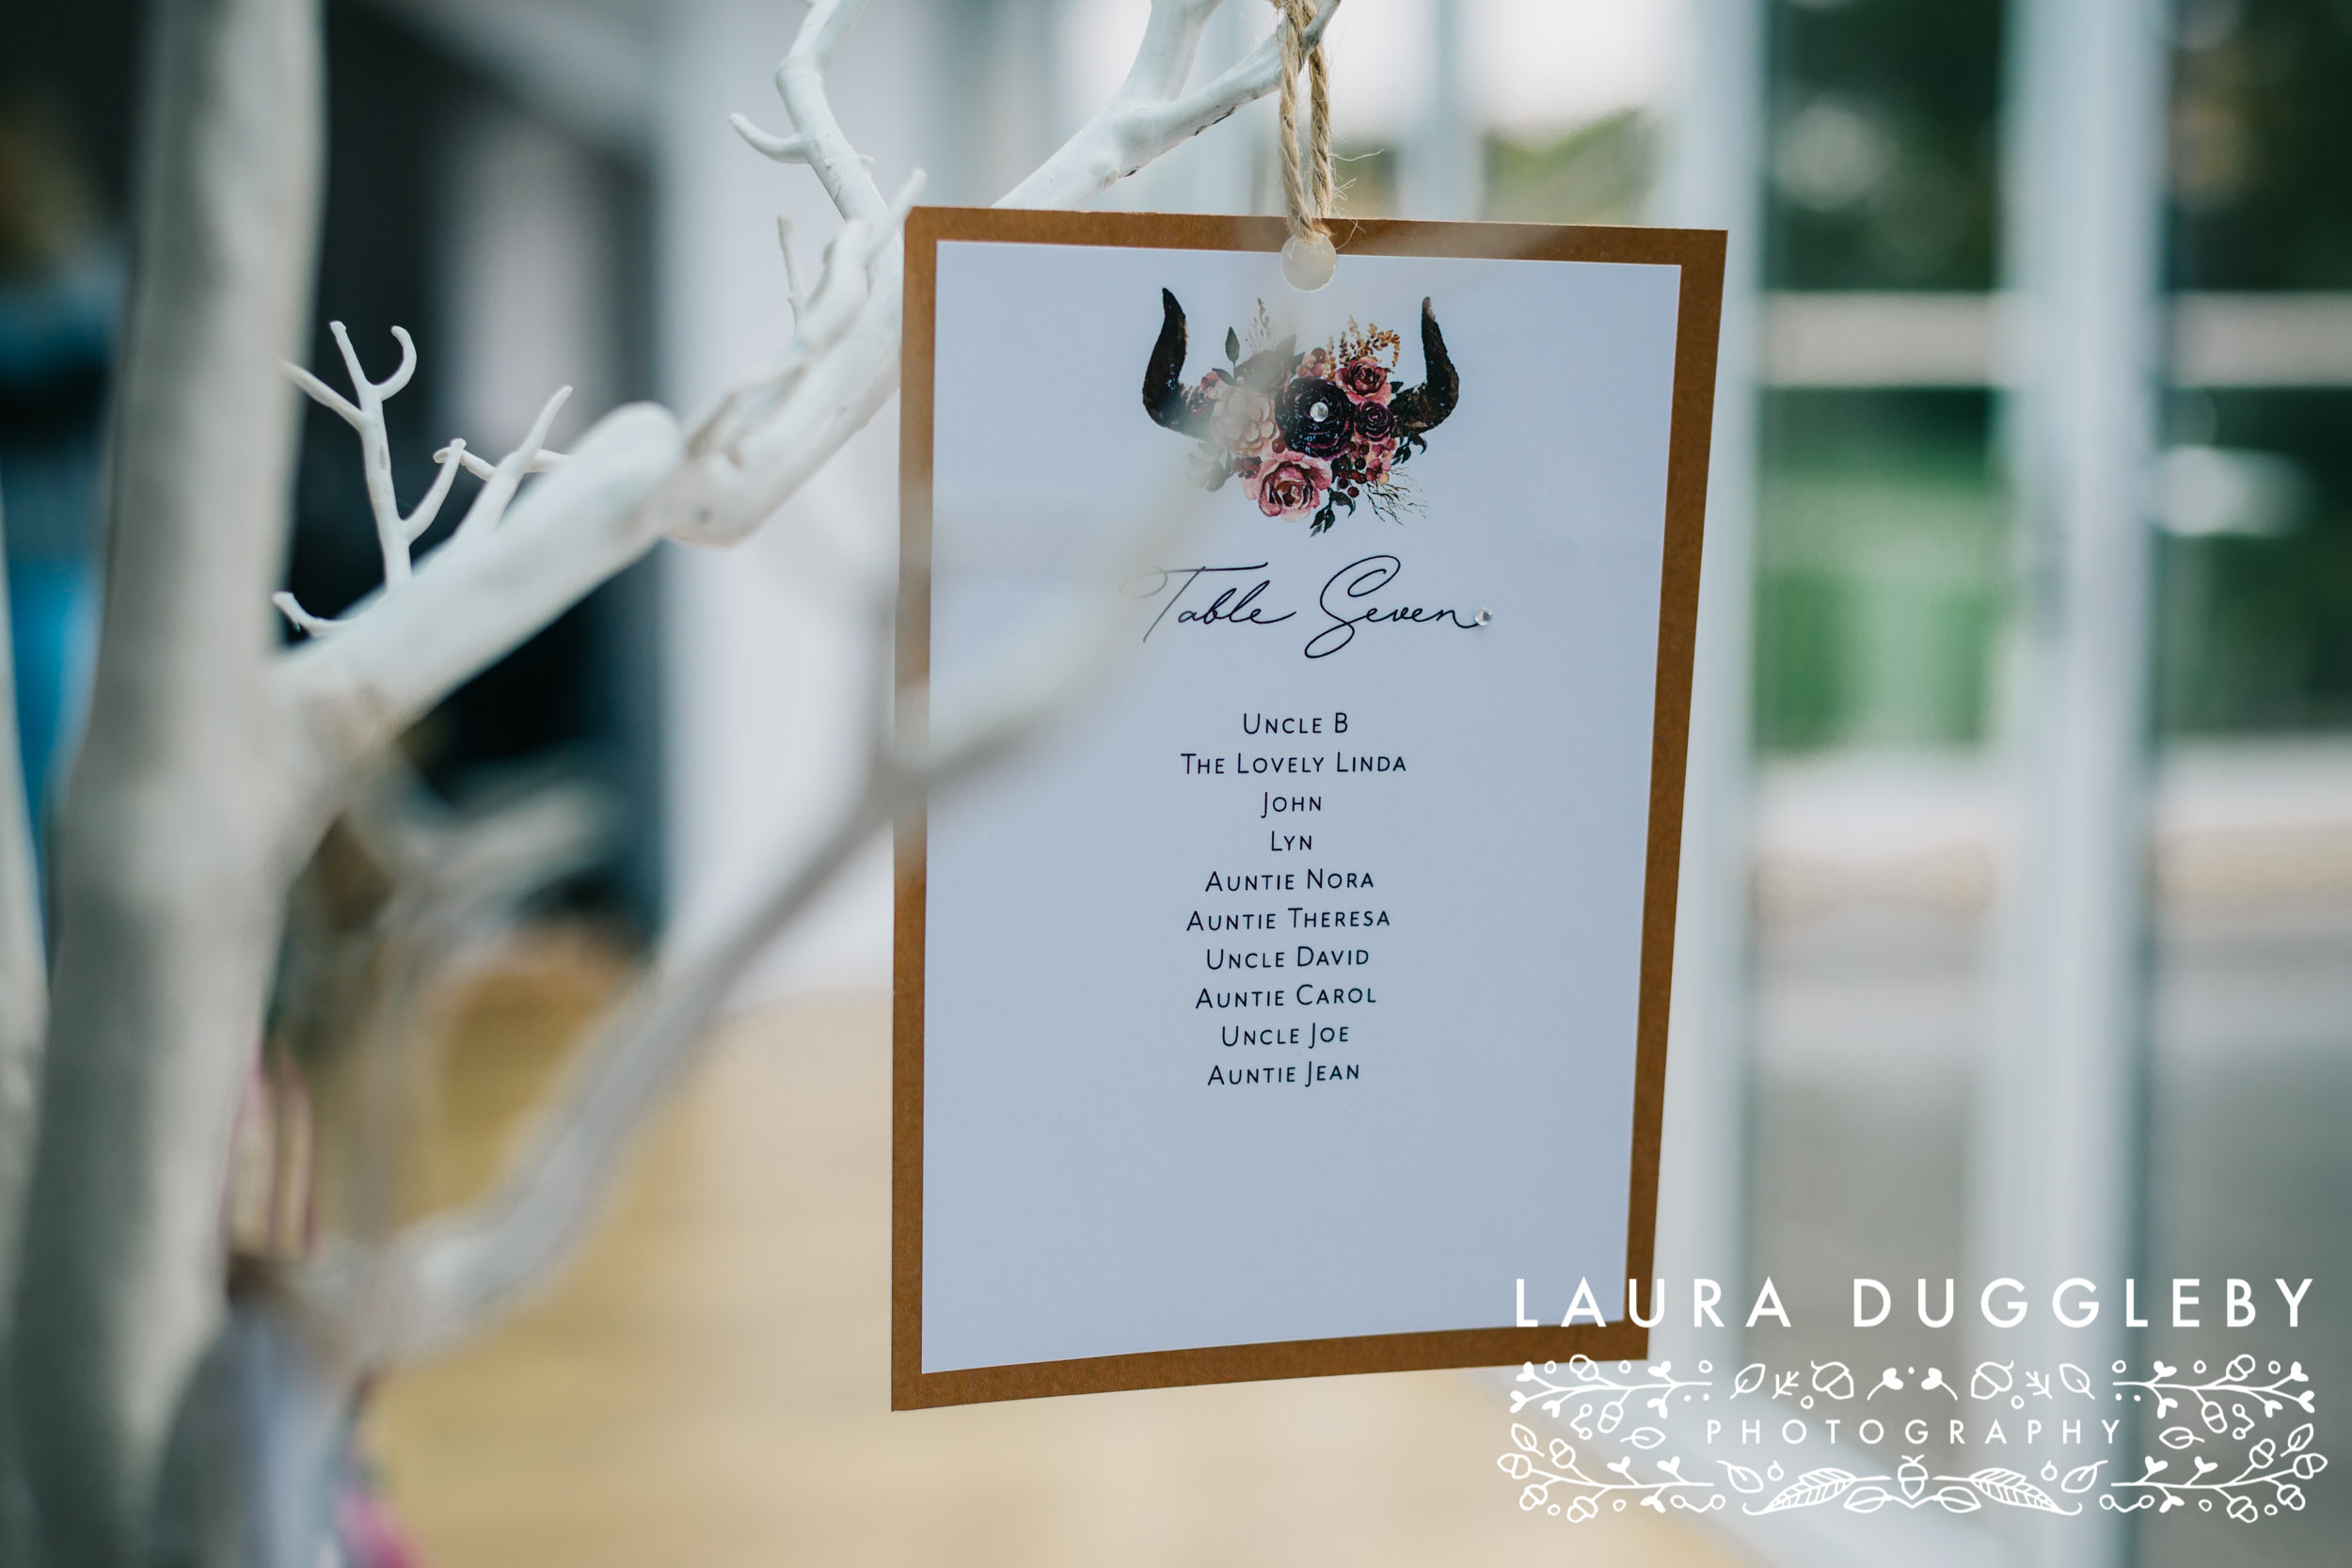 Thornton Hall Country Park - Wedding Photographer21